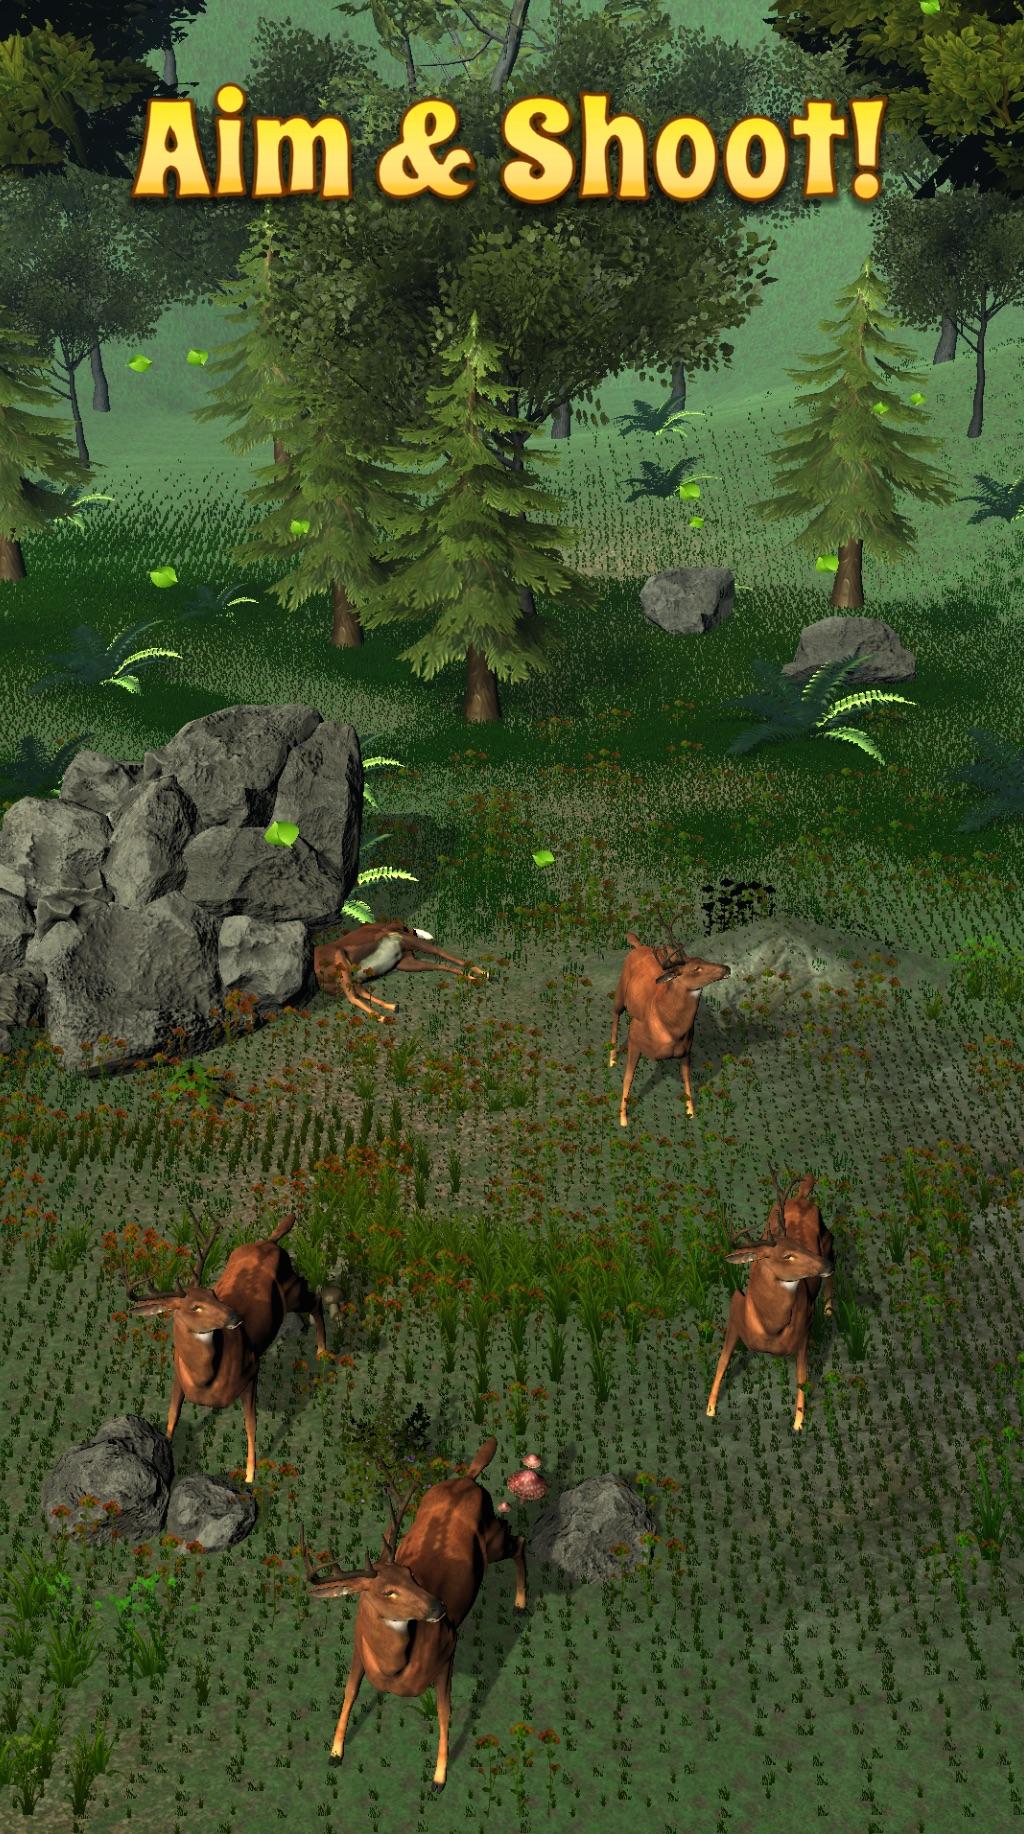 BGH-pull-tab-game-screen-shot-Bonus